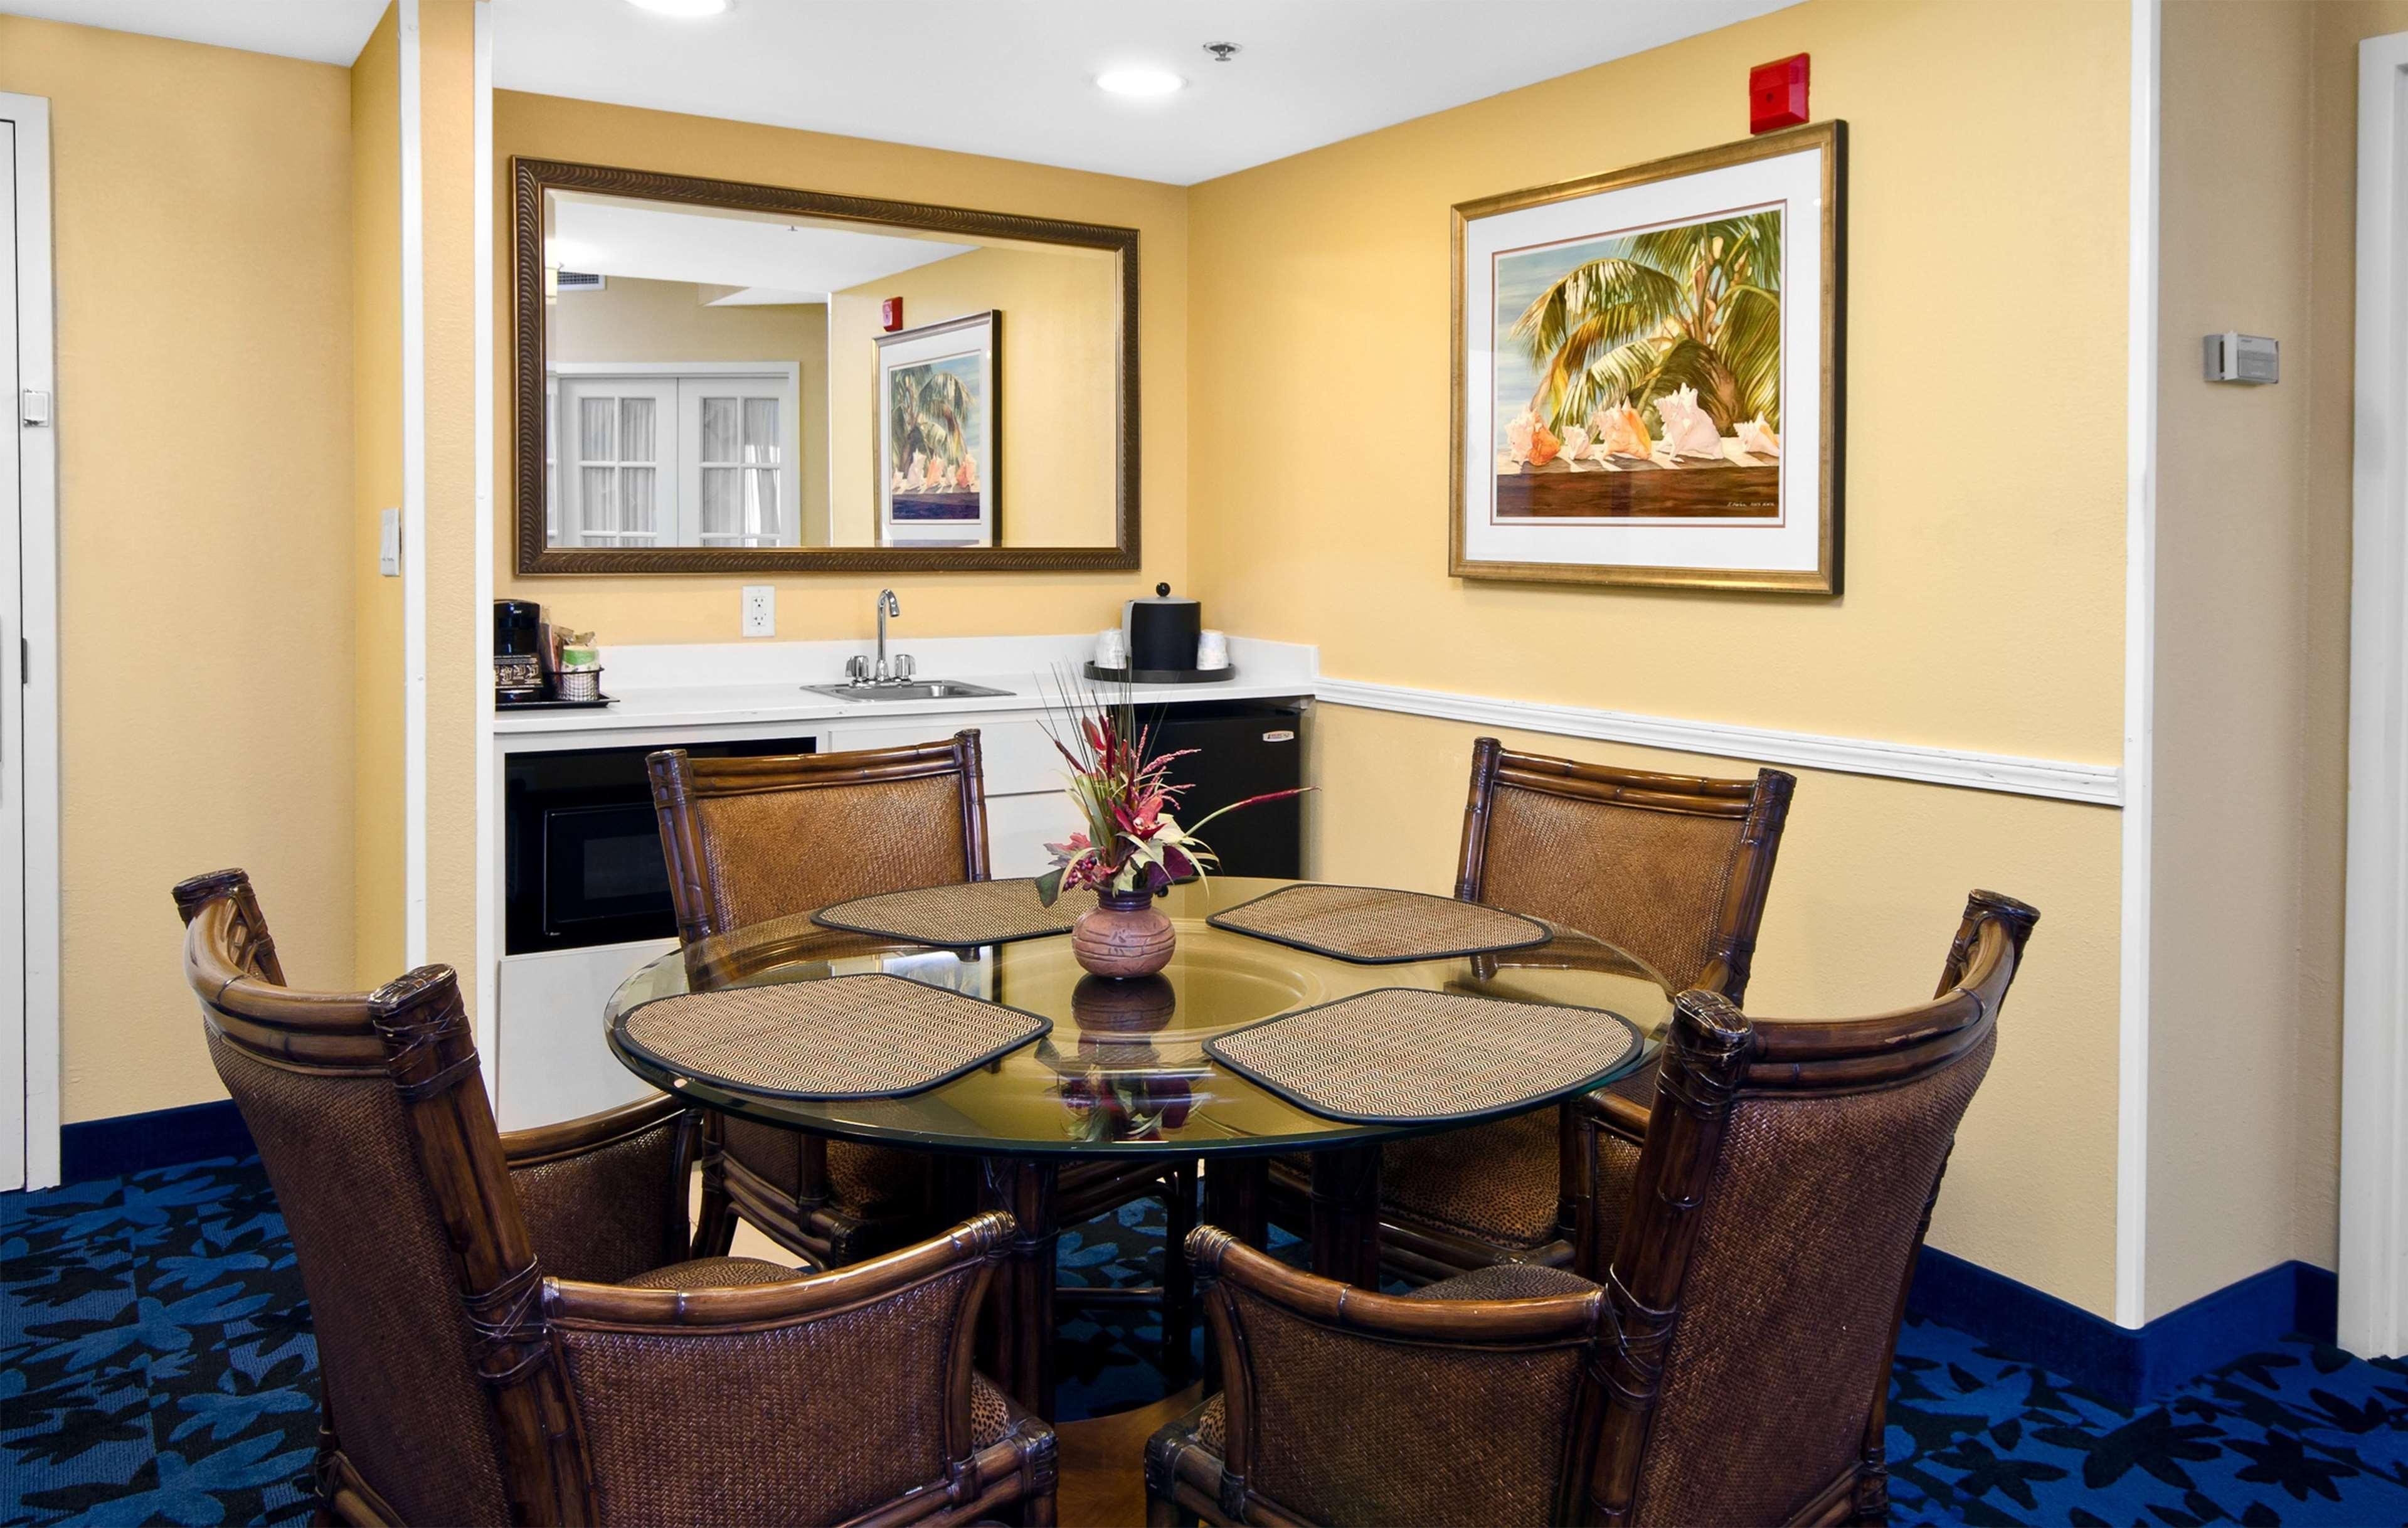 Hampton Inn & Suites Jacksonville South-St. Johns Town Center Area image 30